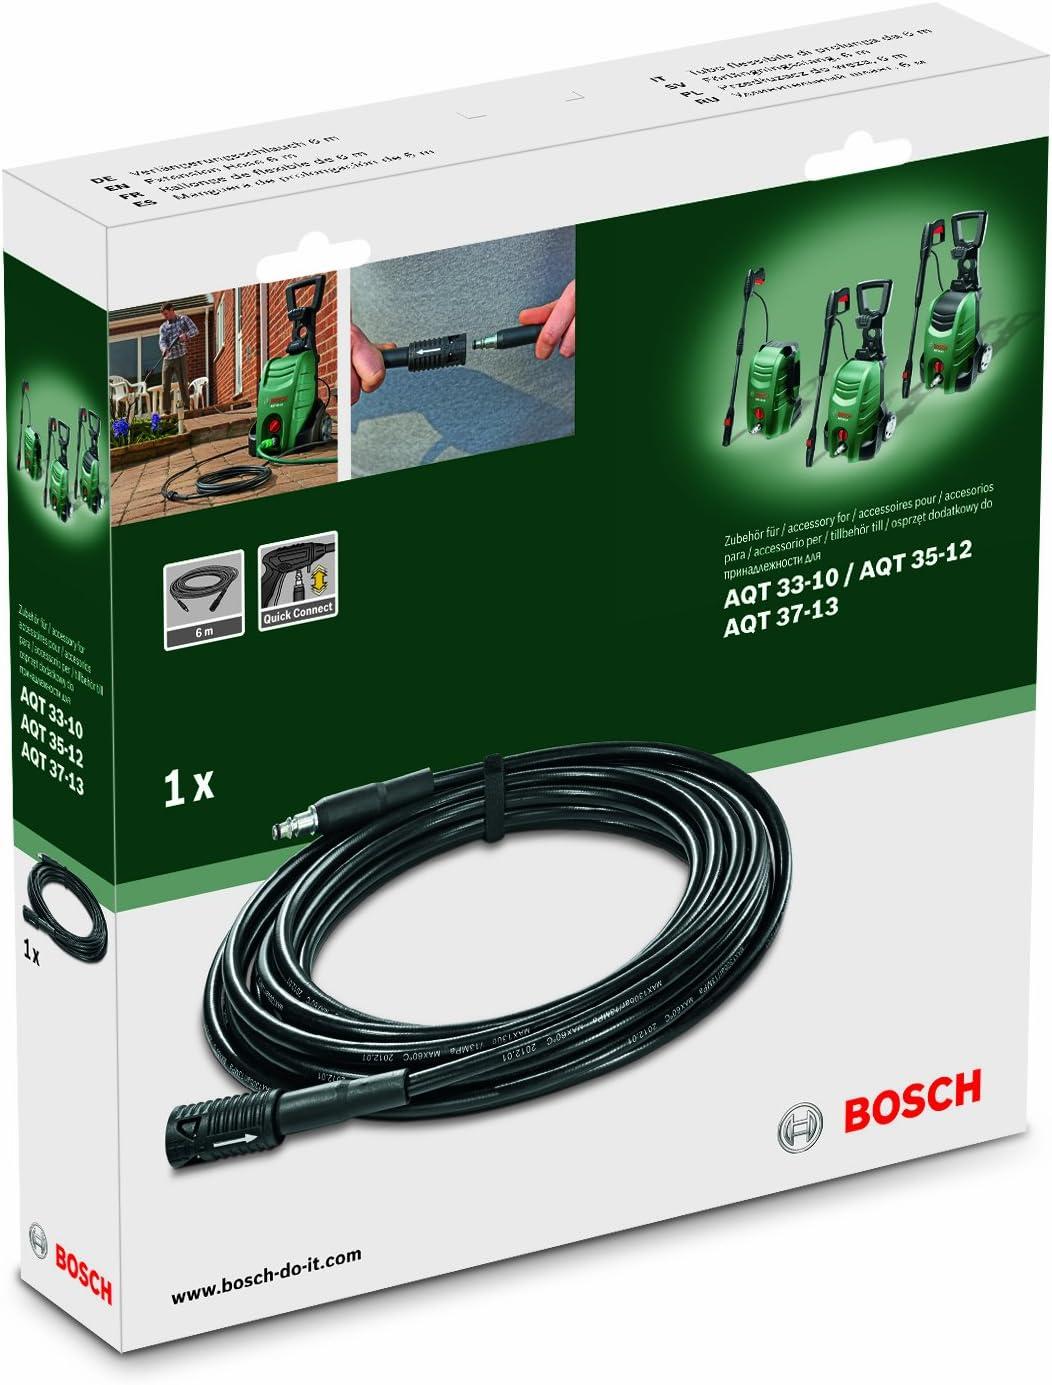 Lavadora BOSCH AQT ahorradores elección 6M manguera de extensión F016800361 3165140761215 D